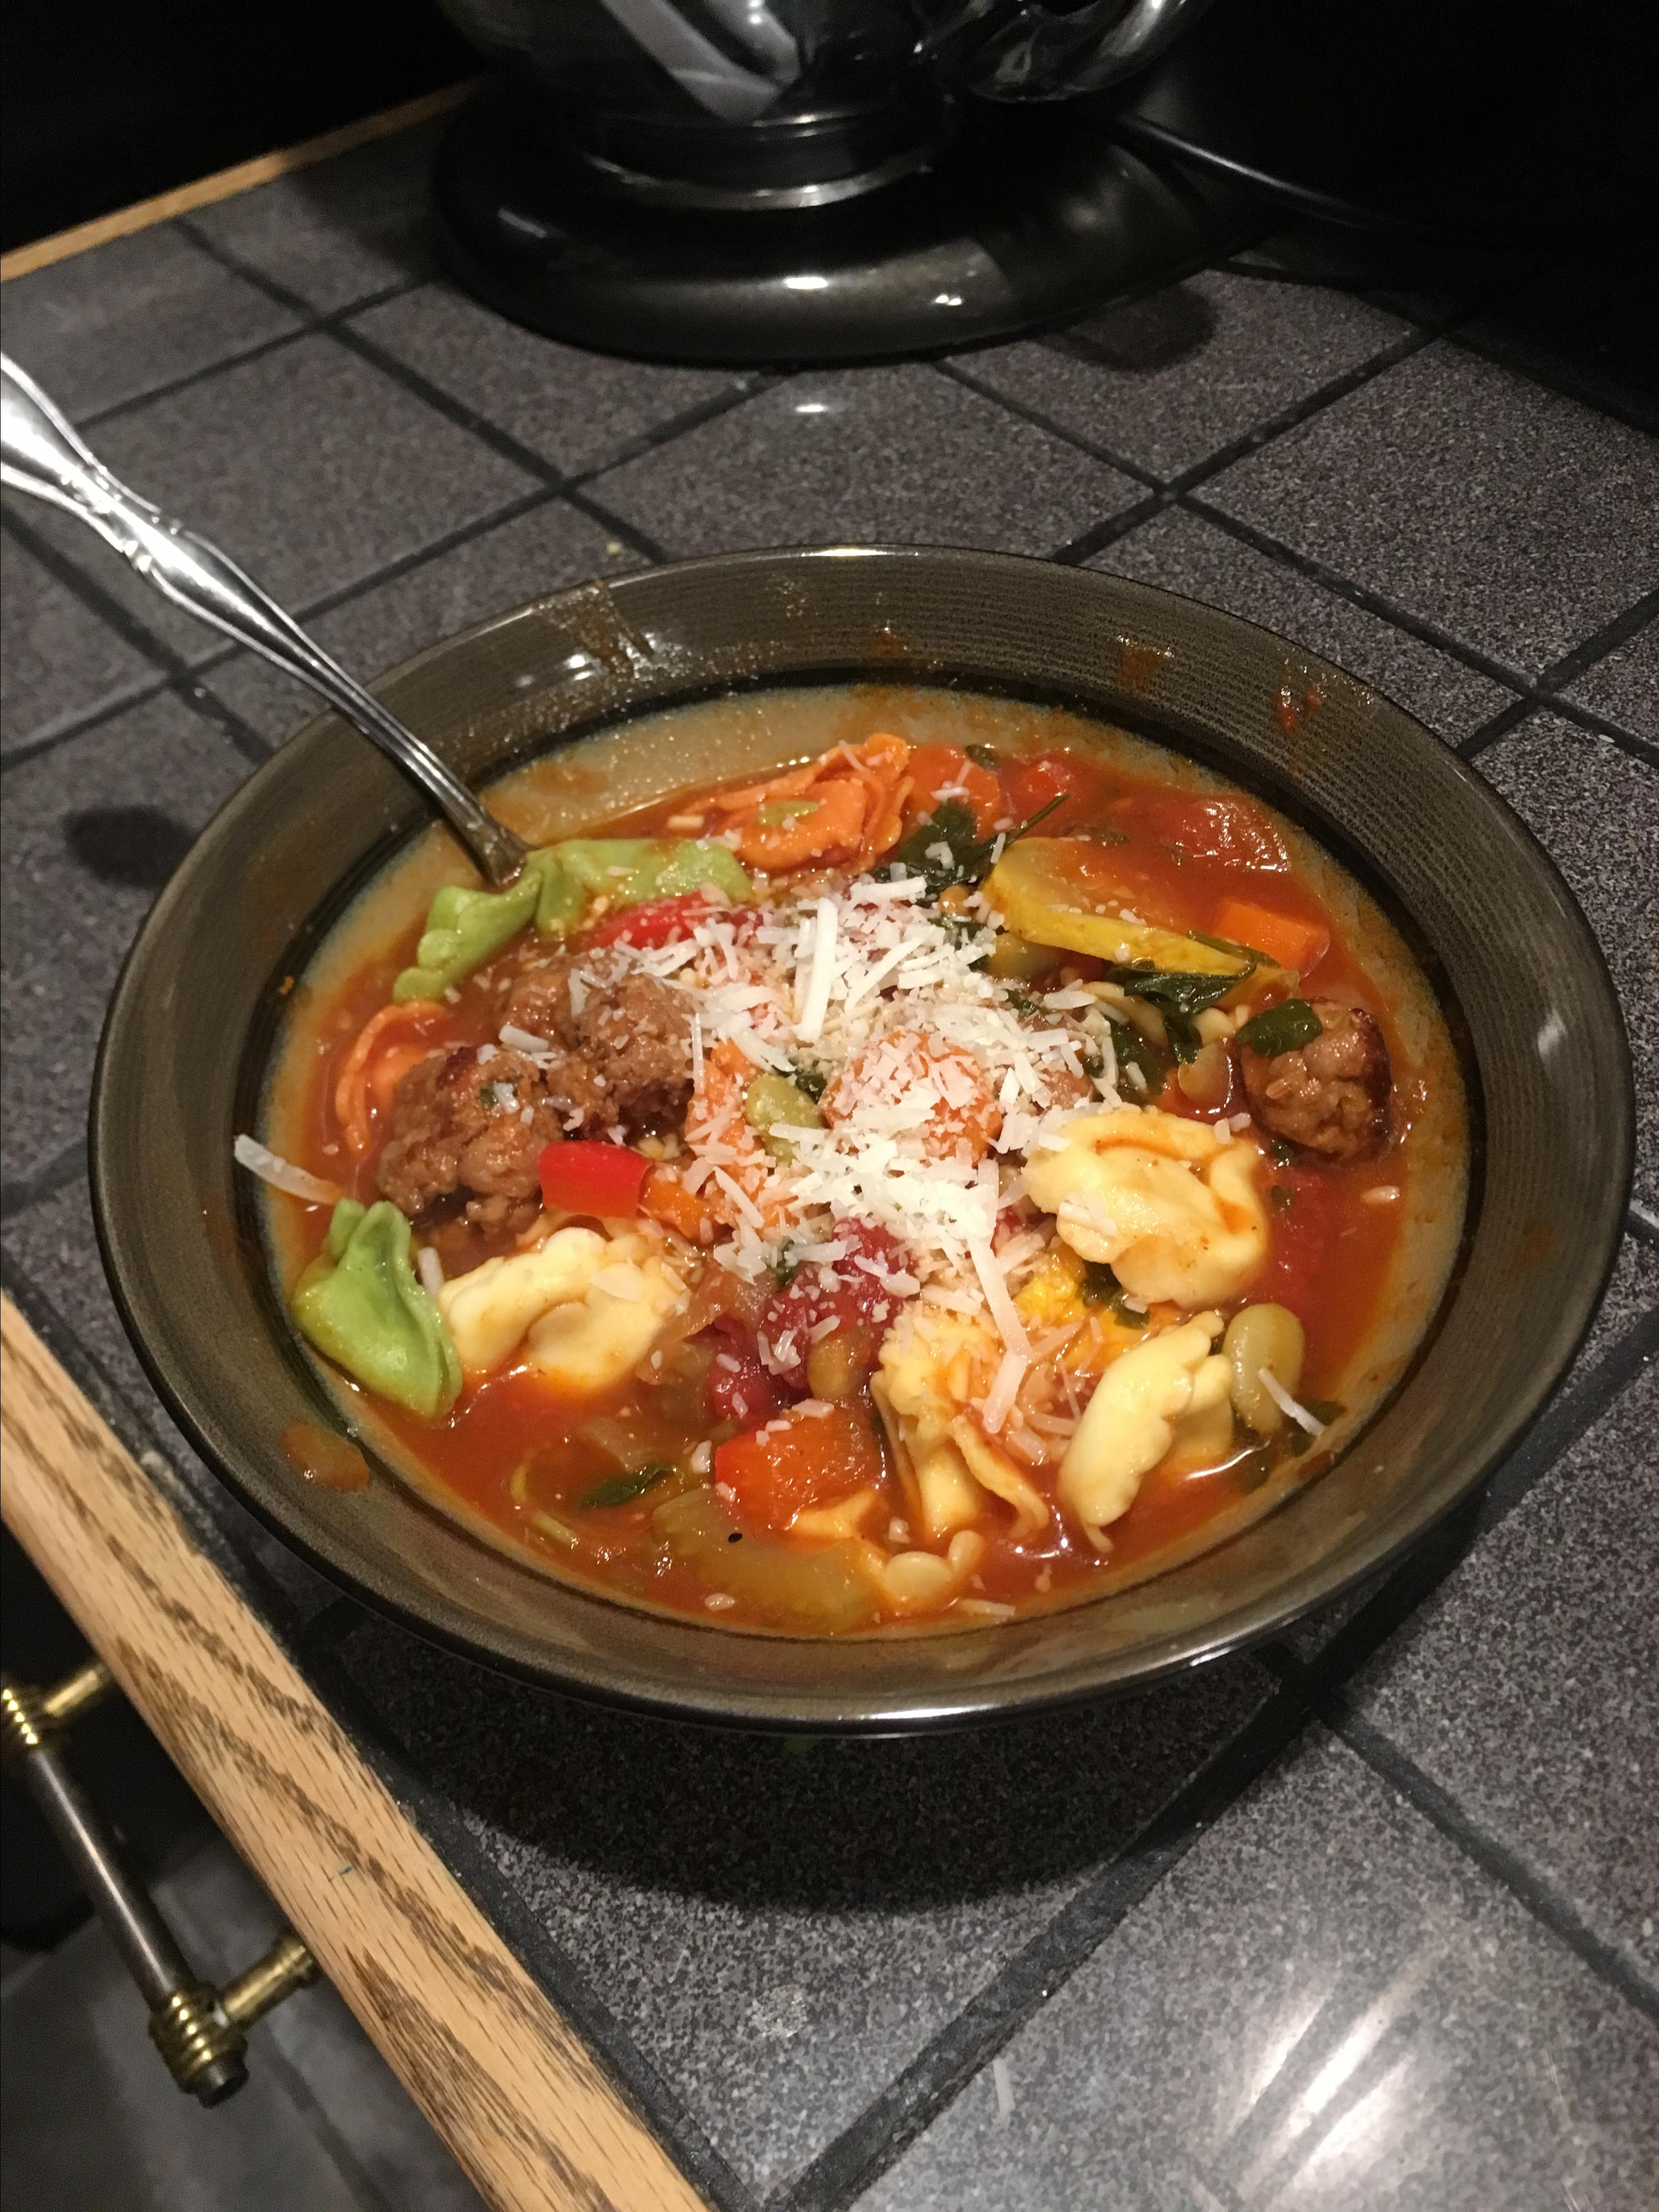 Charlotte's Tortellini Soup